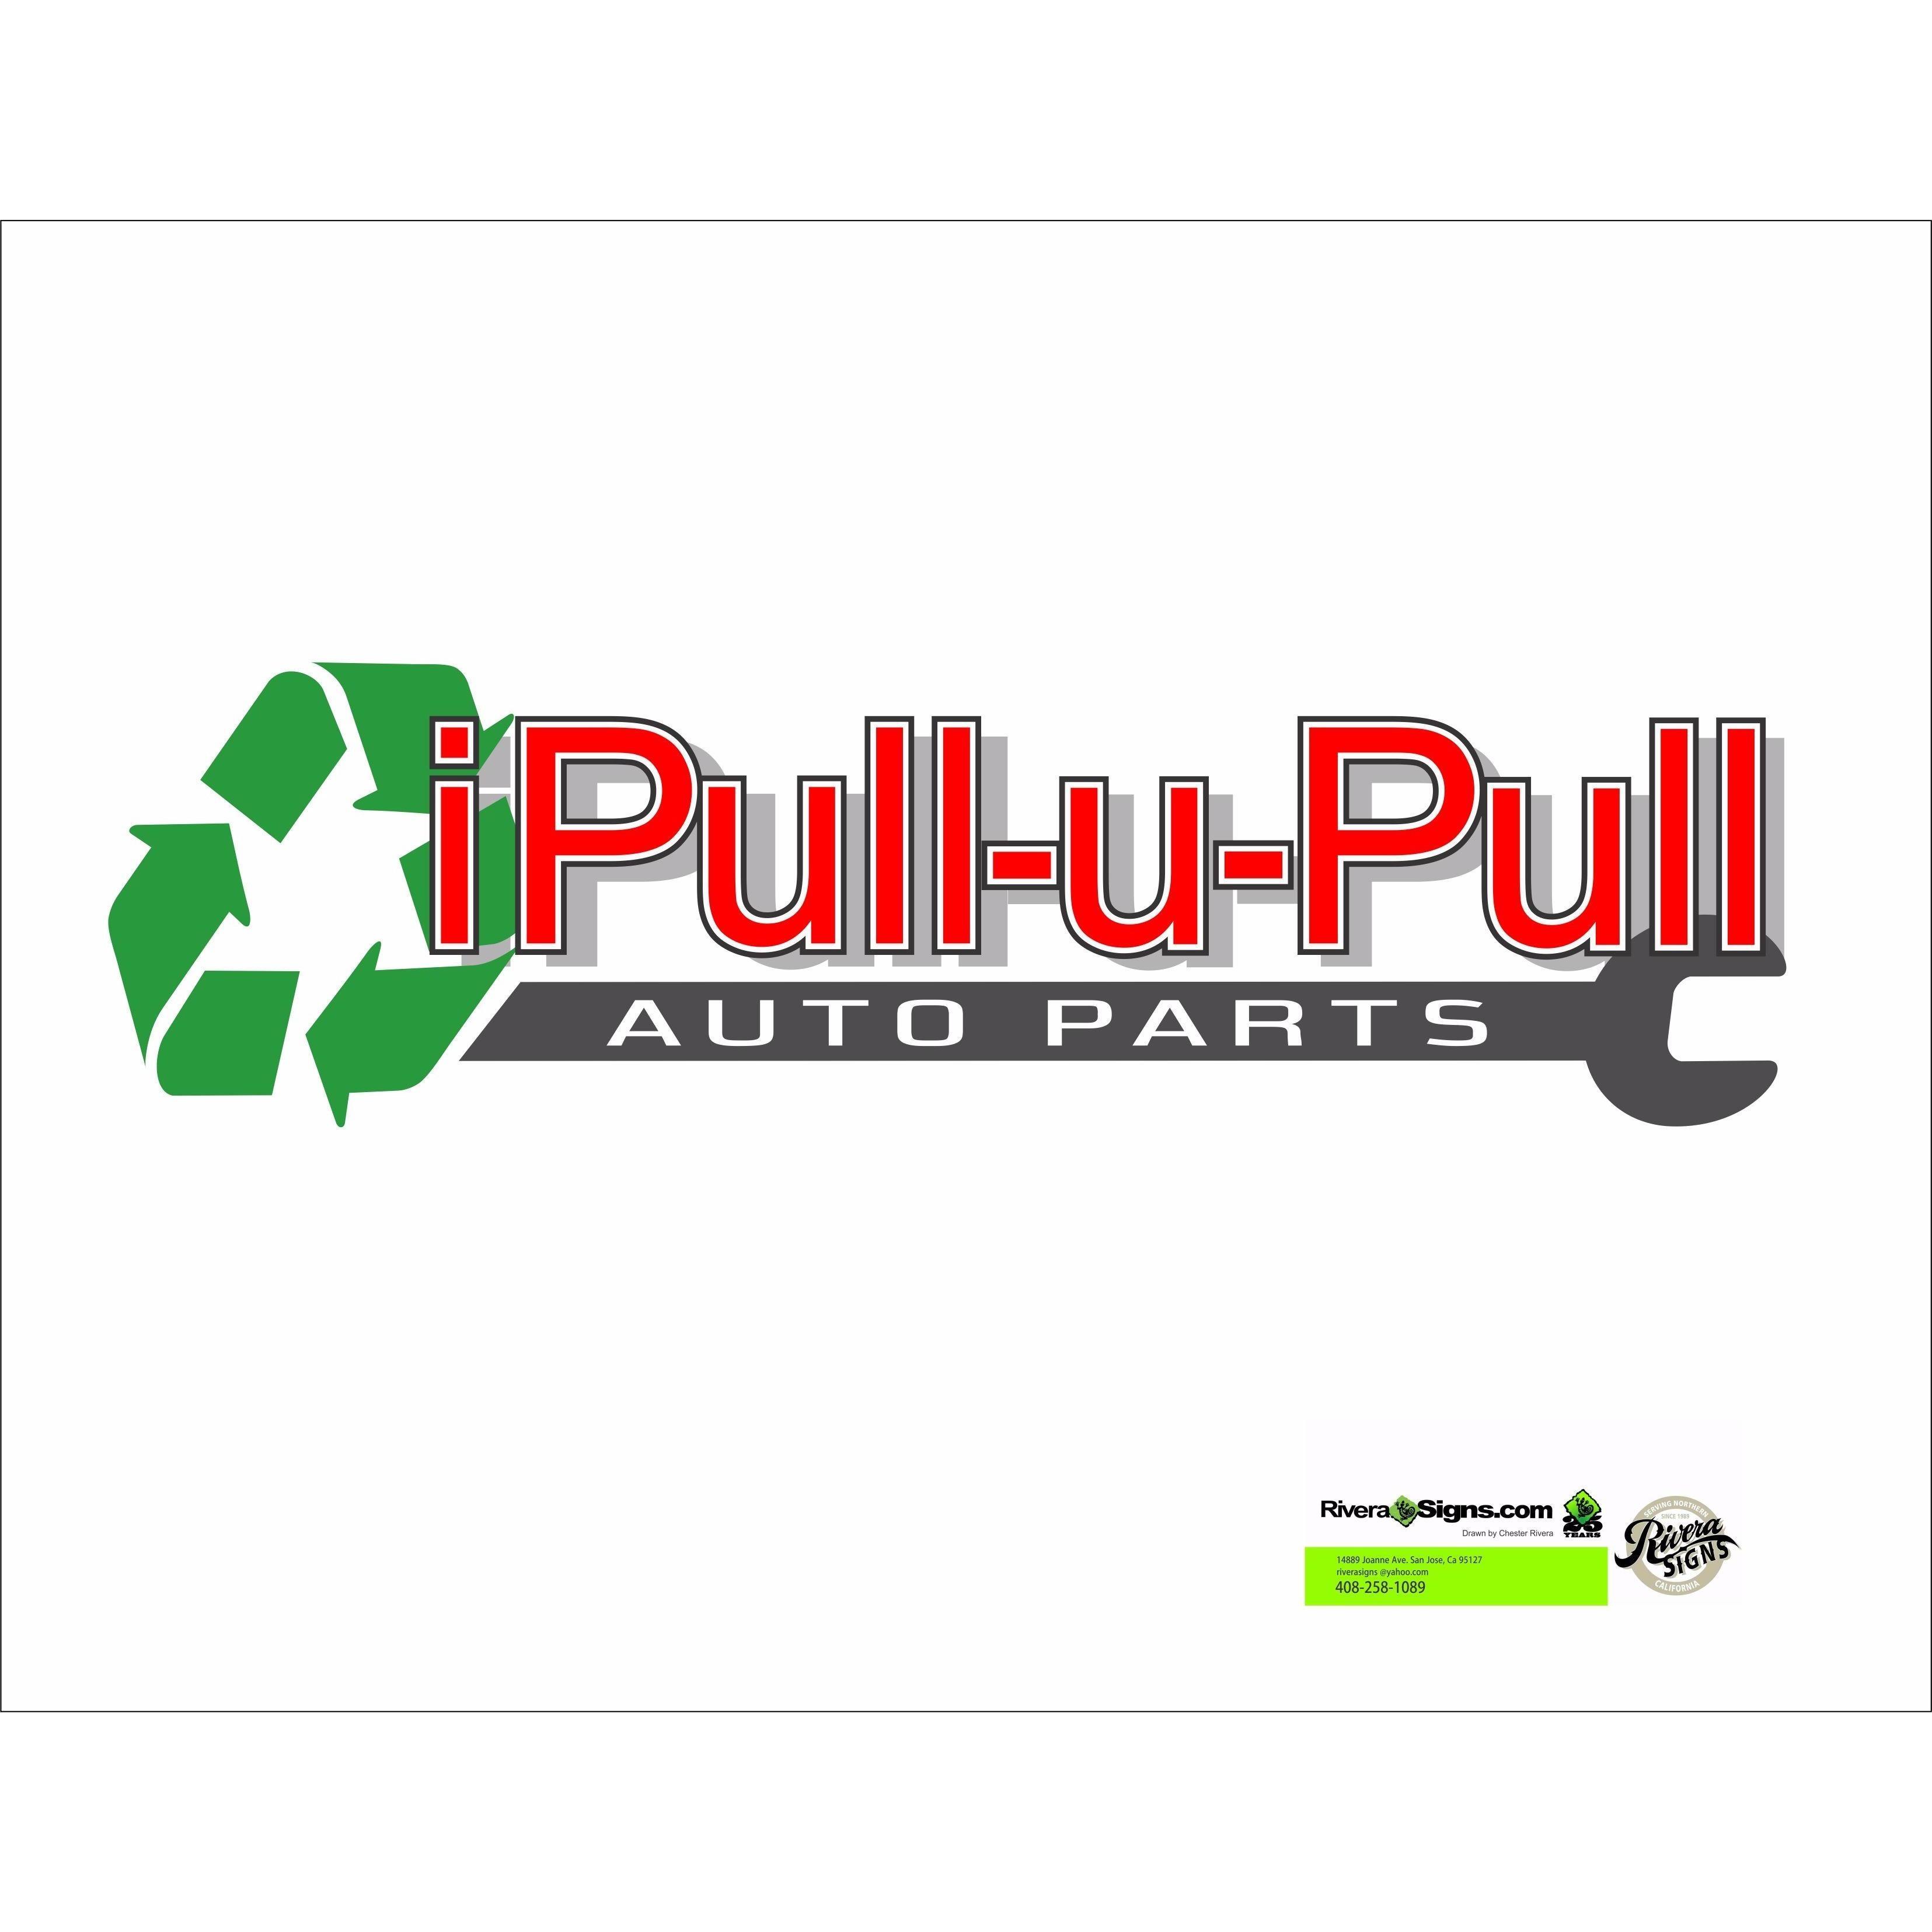 iPull-uPull Auto Parts image 12